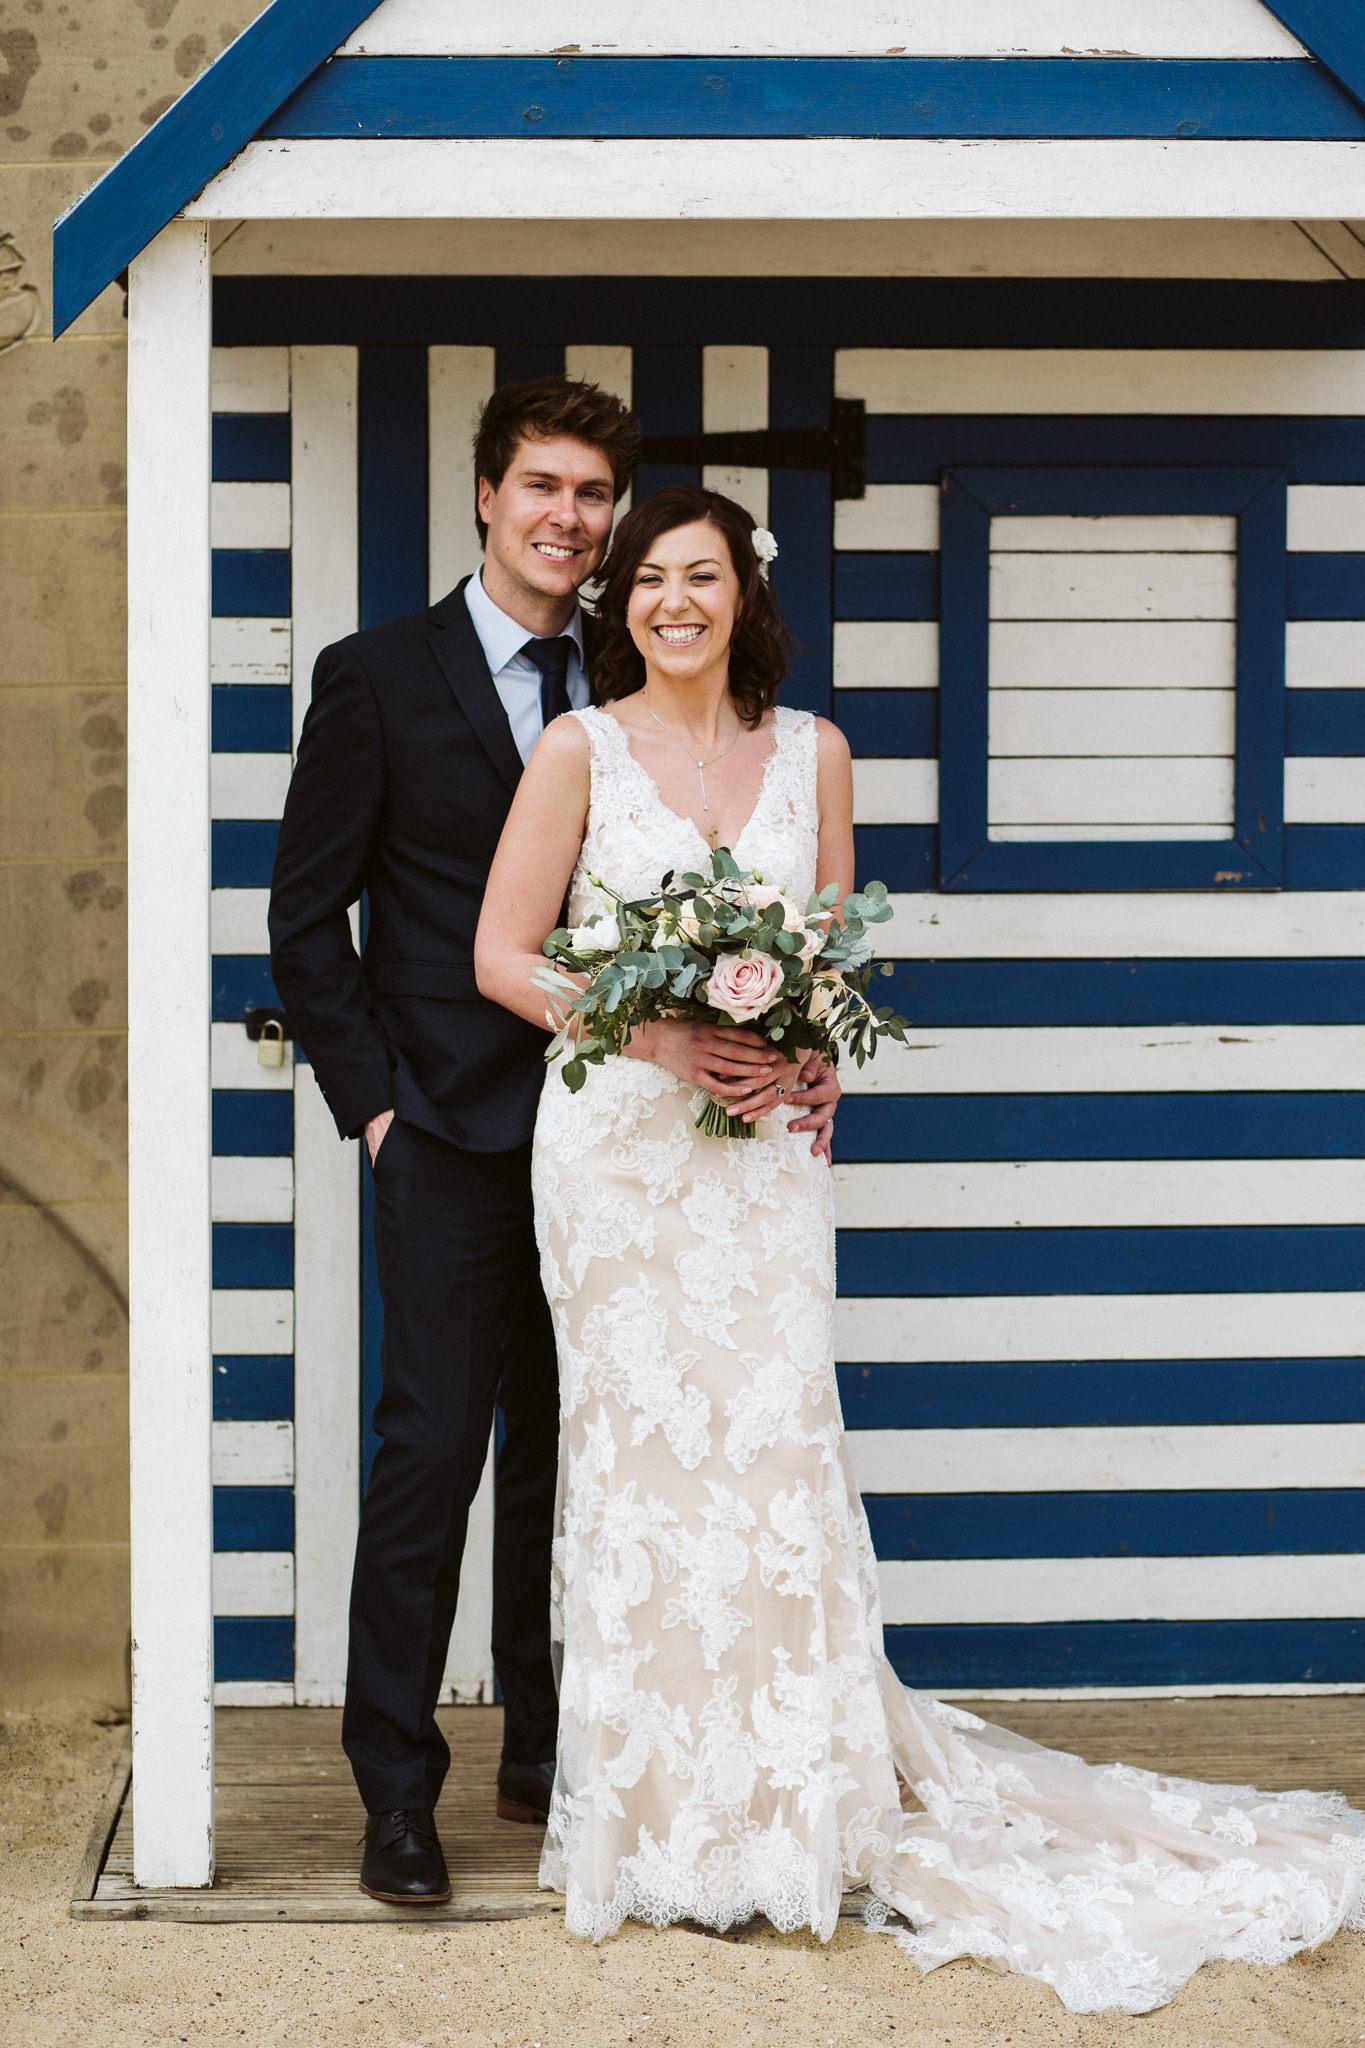 baltic-wedding-margarita-hope (46).jpg